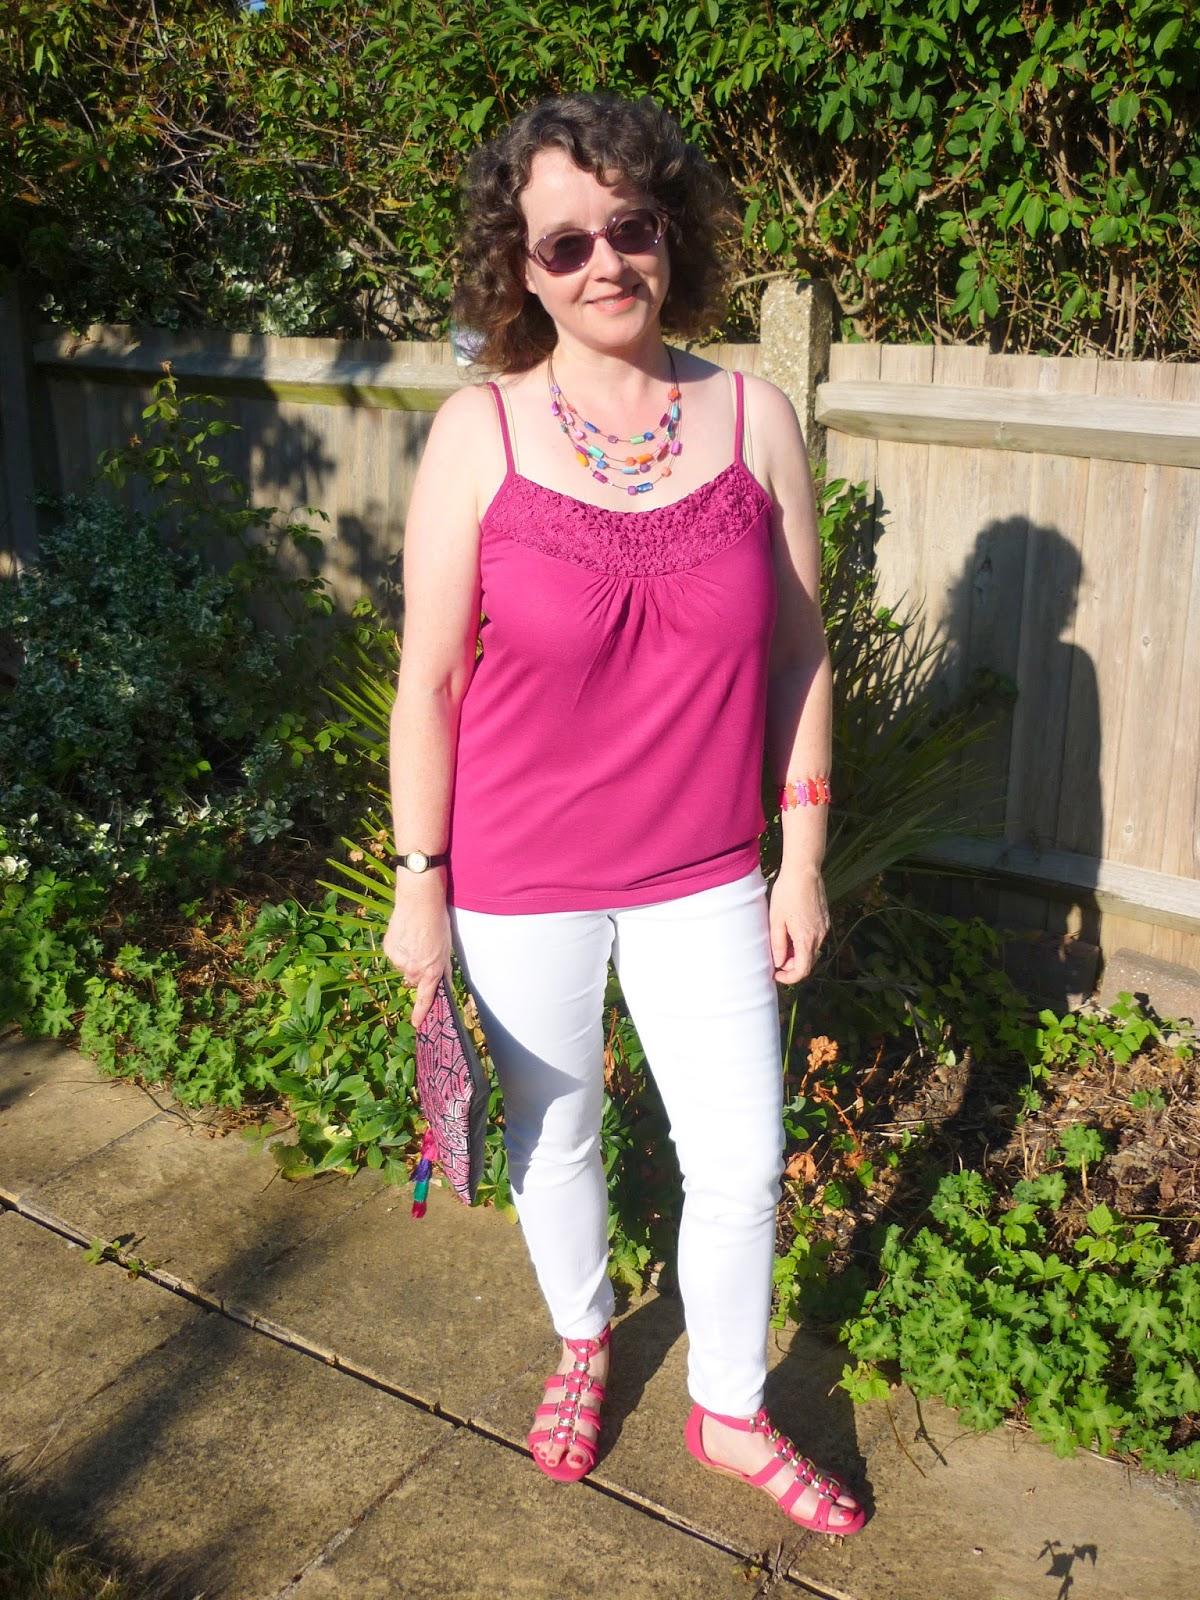 Aztec Clutch, White Jeans, Hot Pink Cami | Petite Silver Vixen